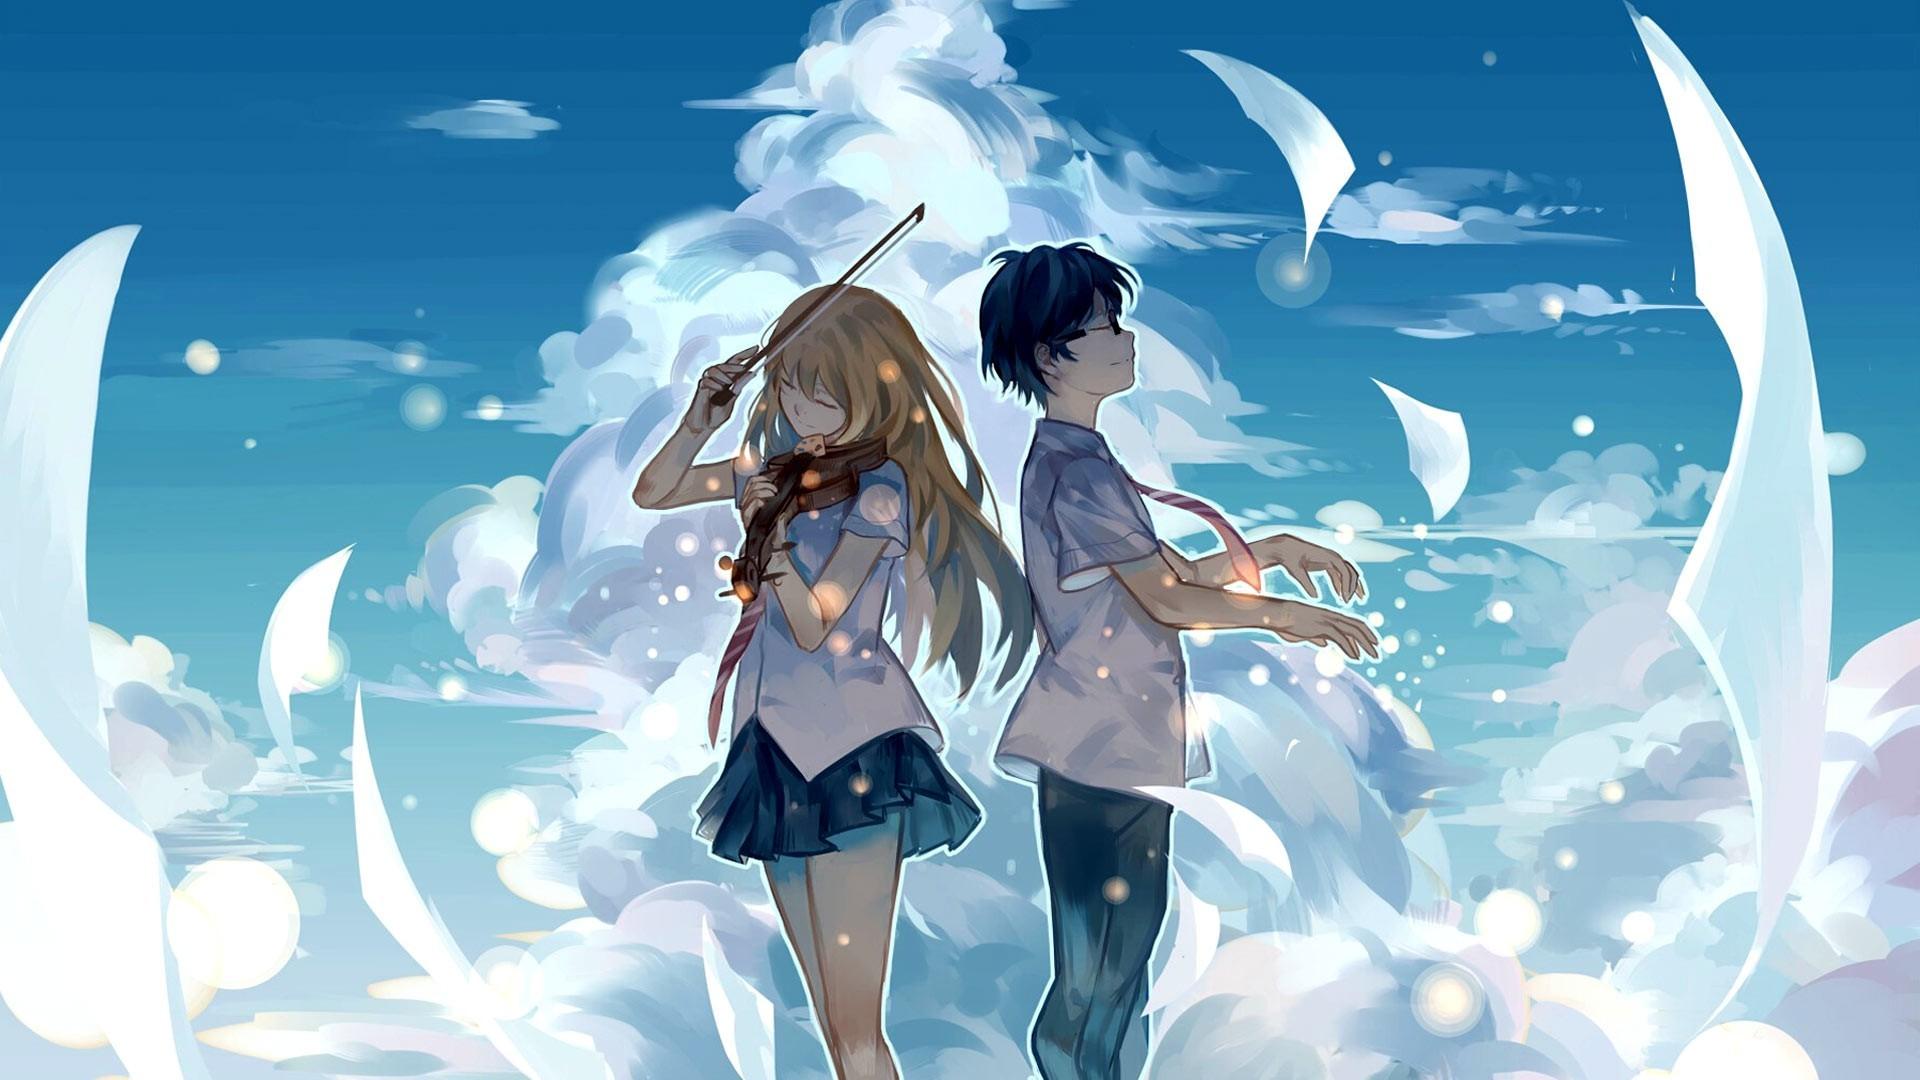 Cute Love Couple Hd Wallpaper Animated Love Couple Wallpapers Romantic Boy Girls P Hd Wallpapers